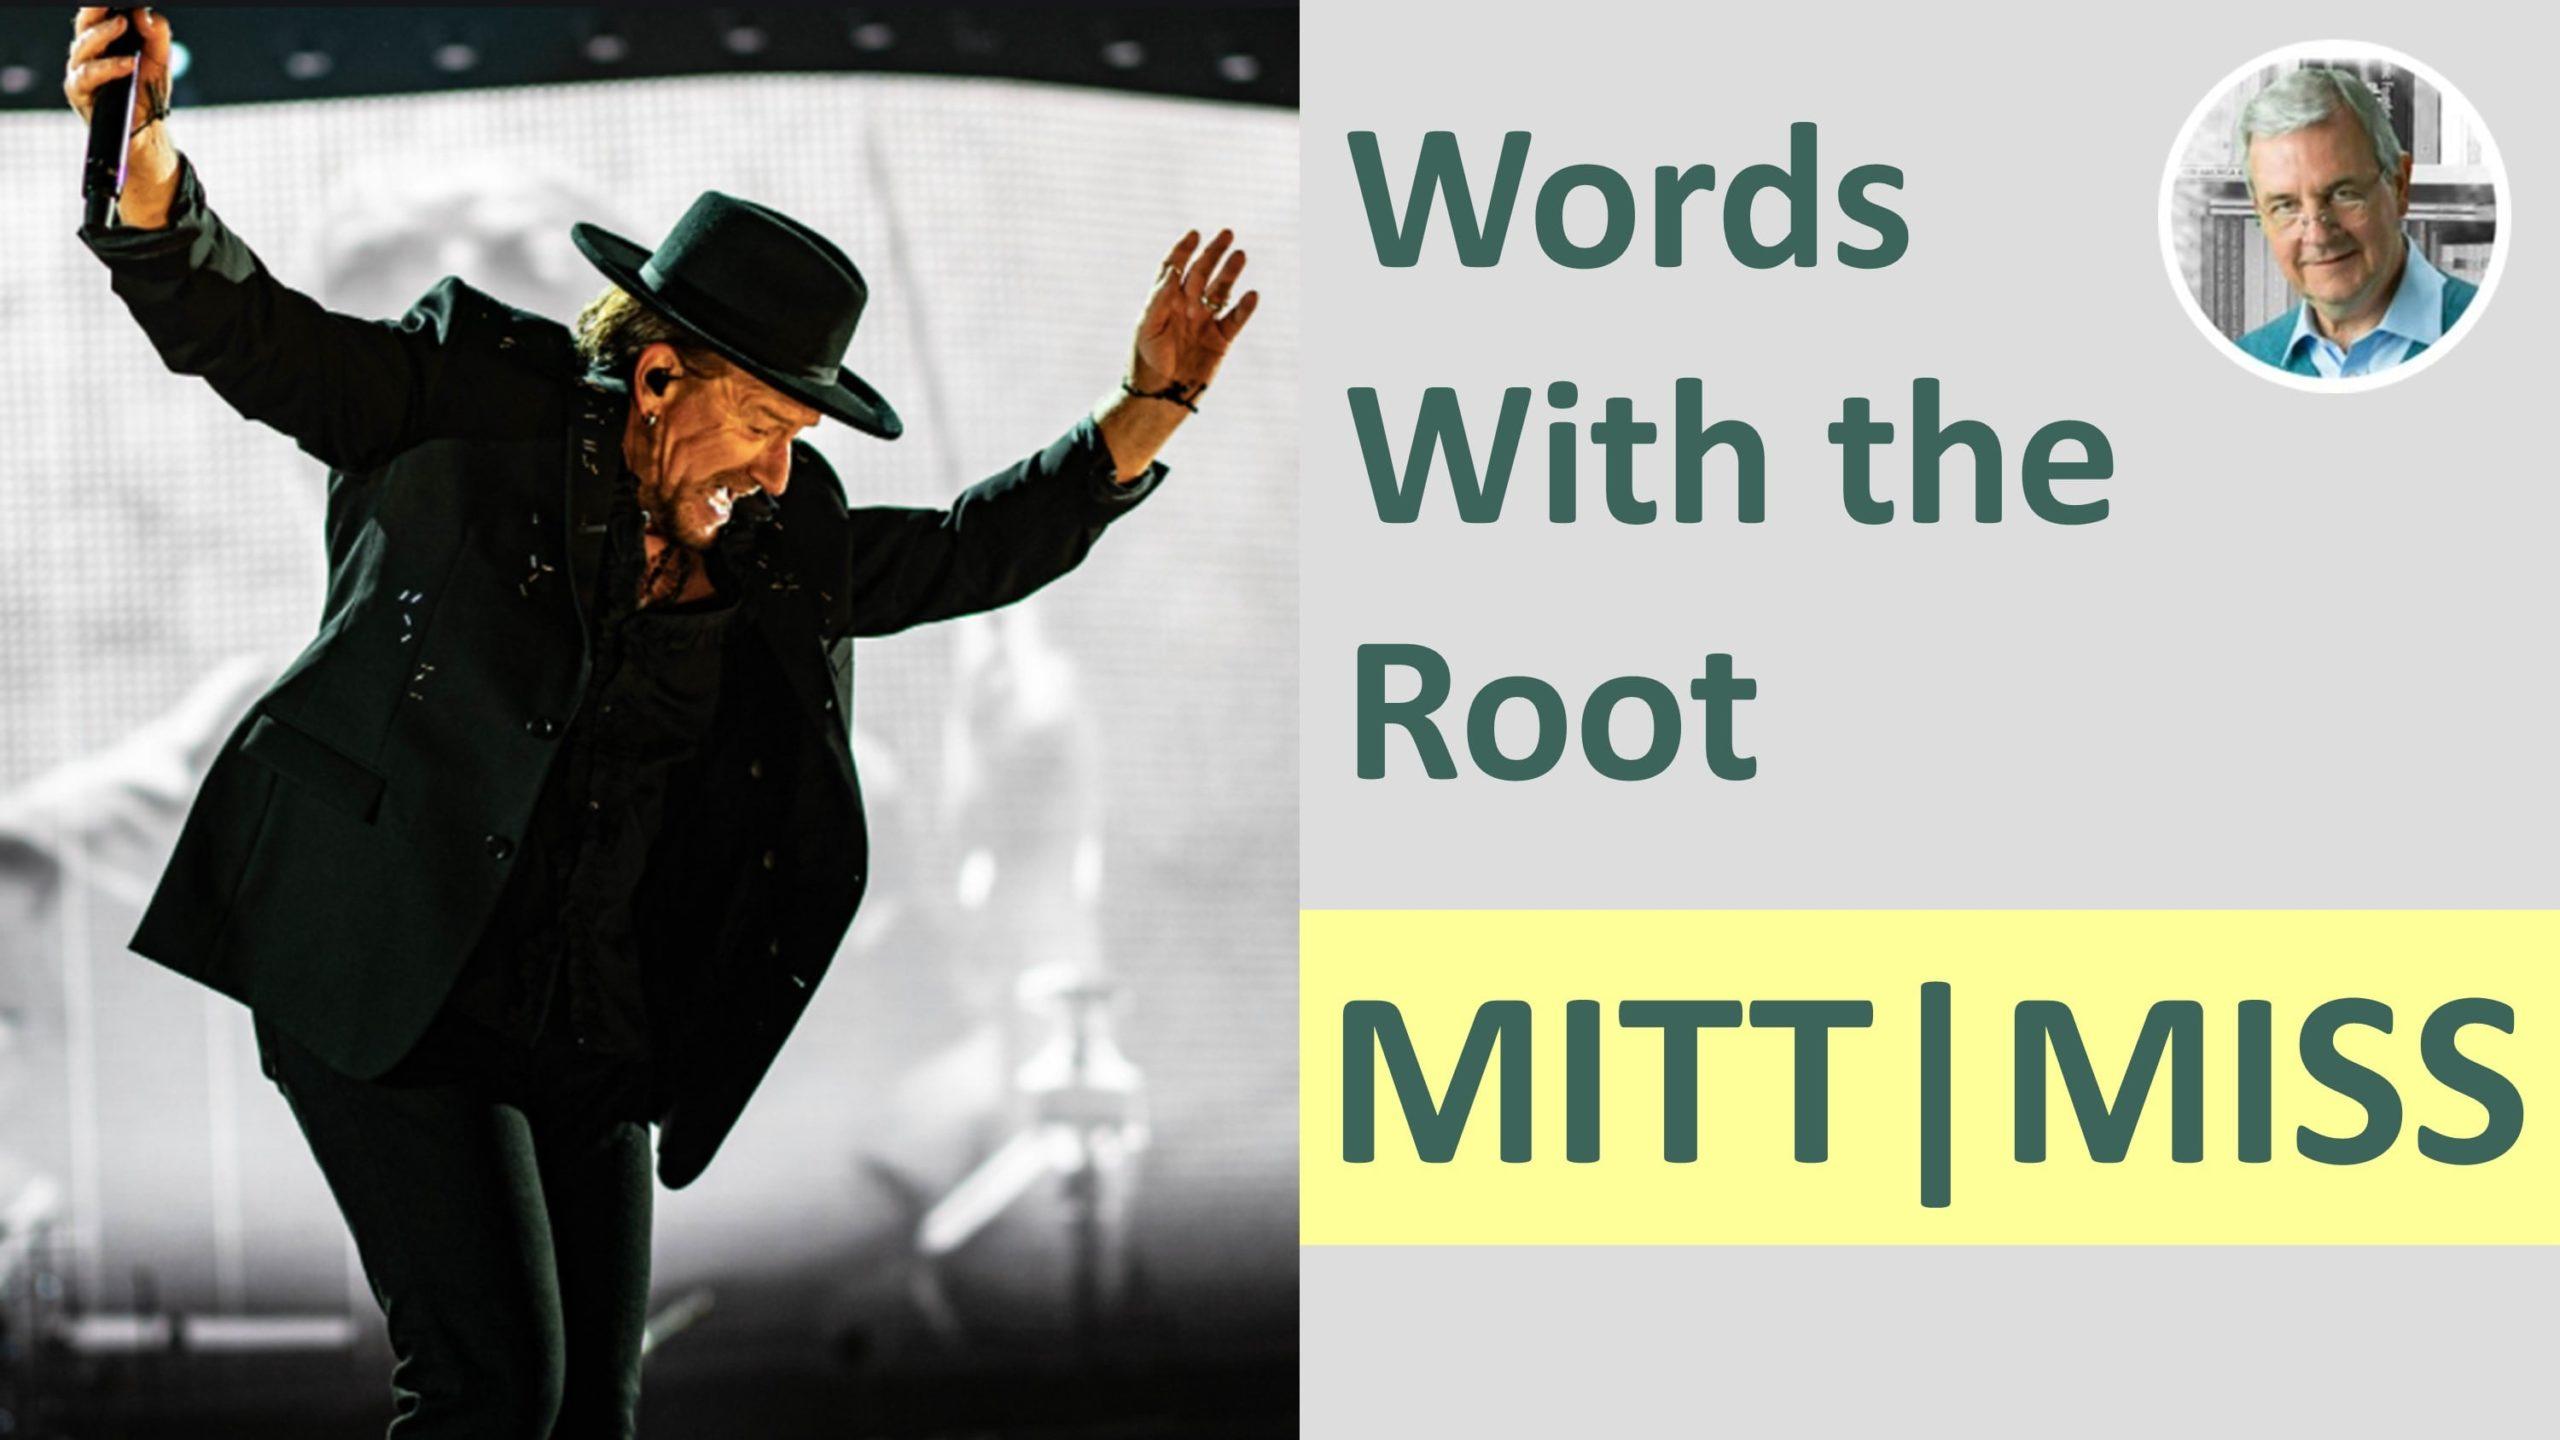 word root miss